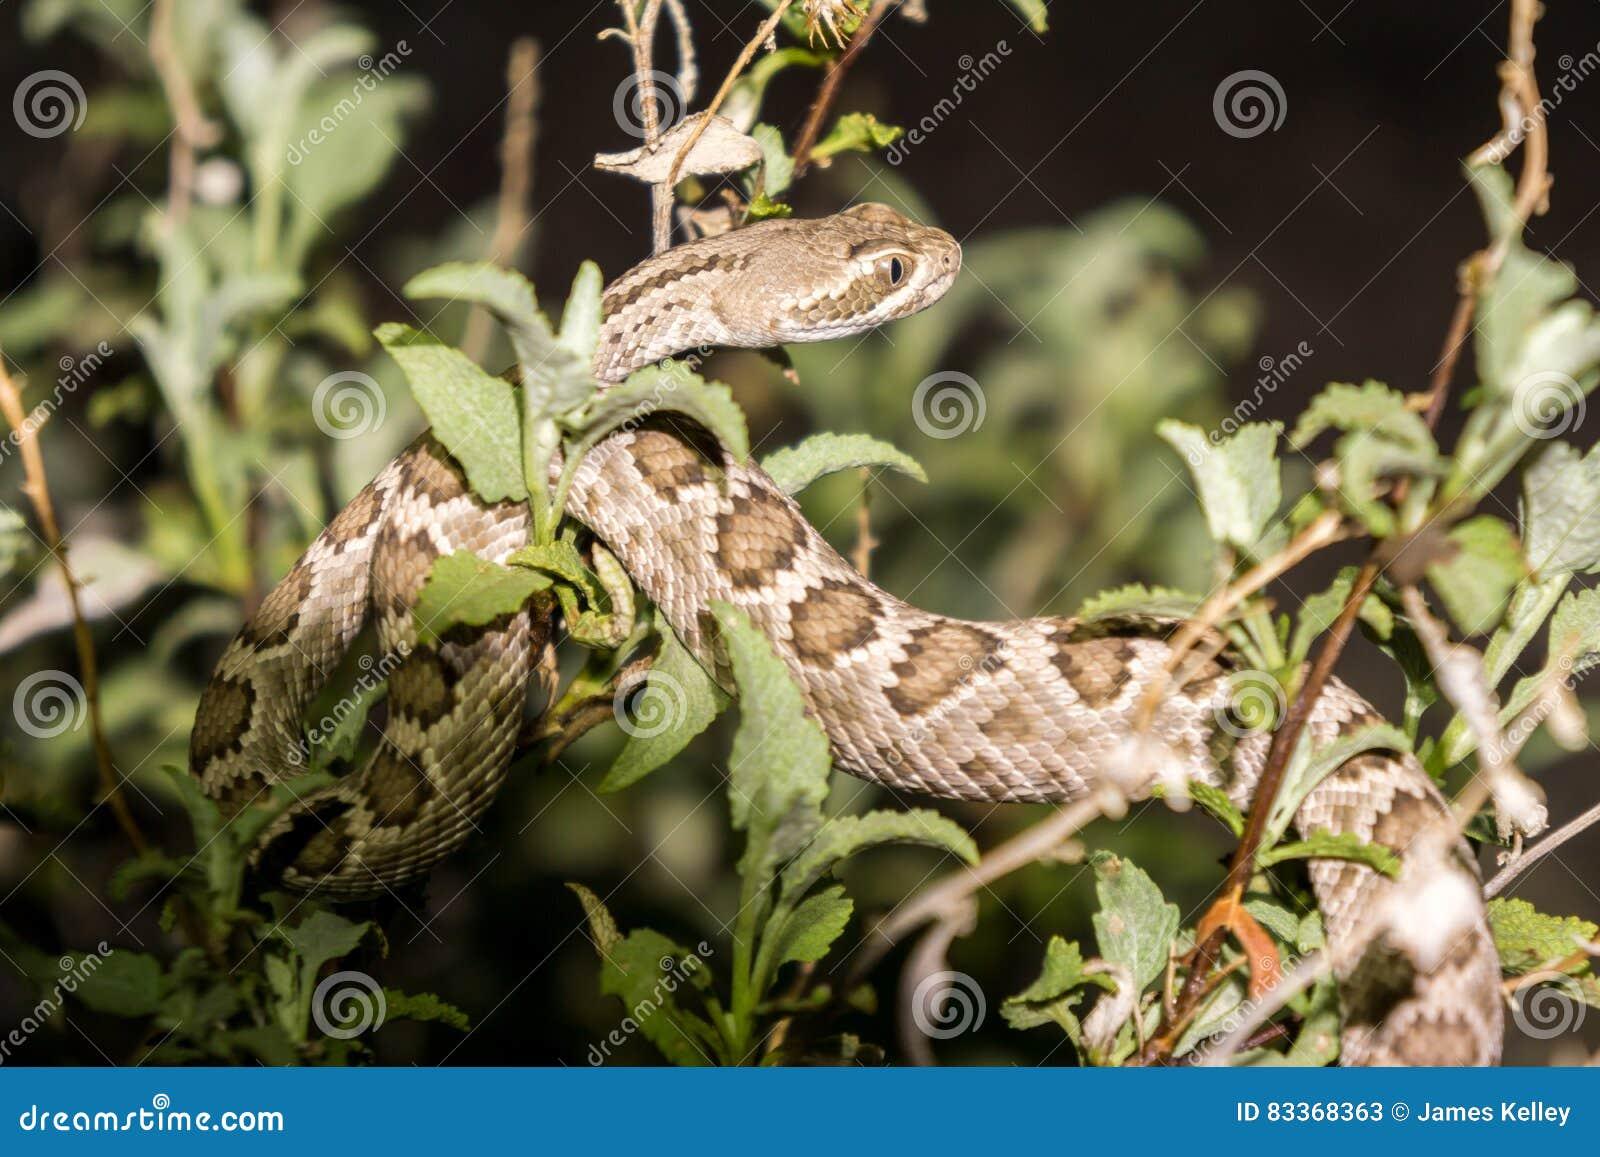 Mojave Rattlesnake In Arizona Desert Stock Image Image Of Scales